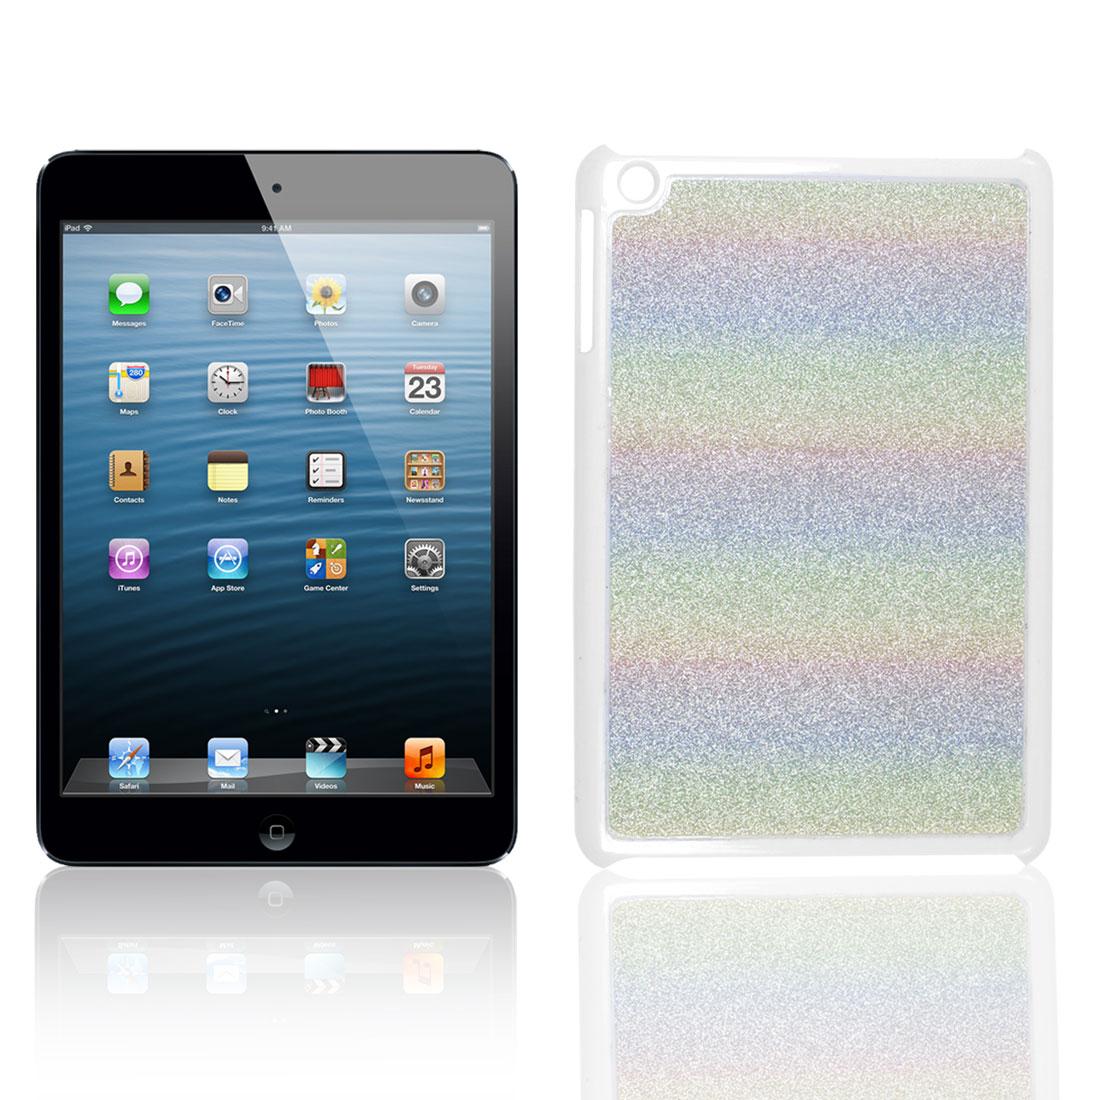 Colorful Glittery Horizontal Stripes Coated Hard Back Case Cover for iPad Mini